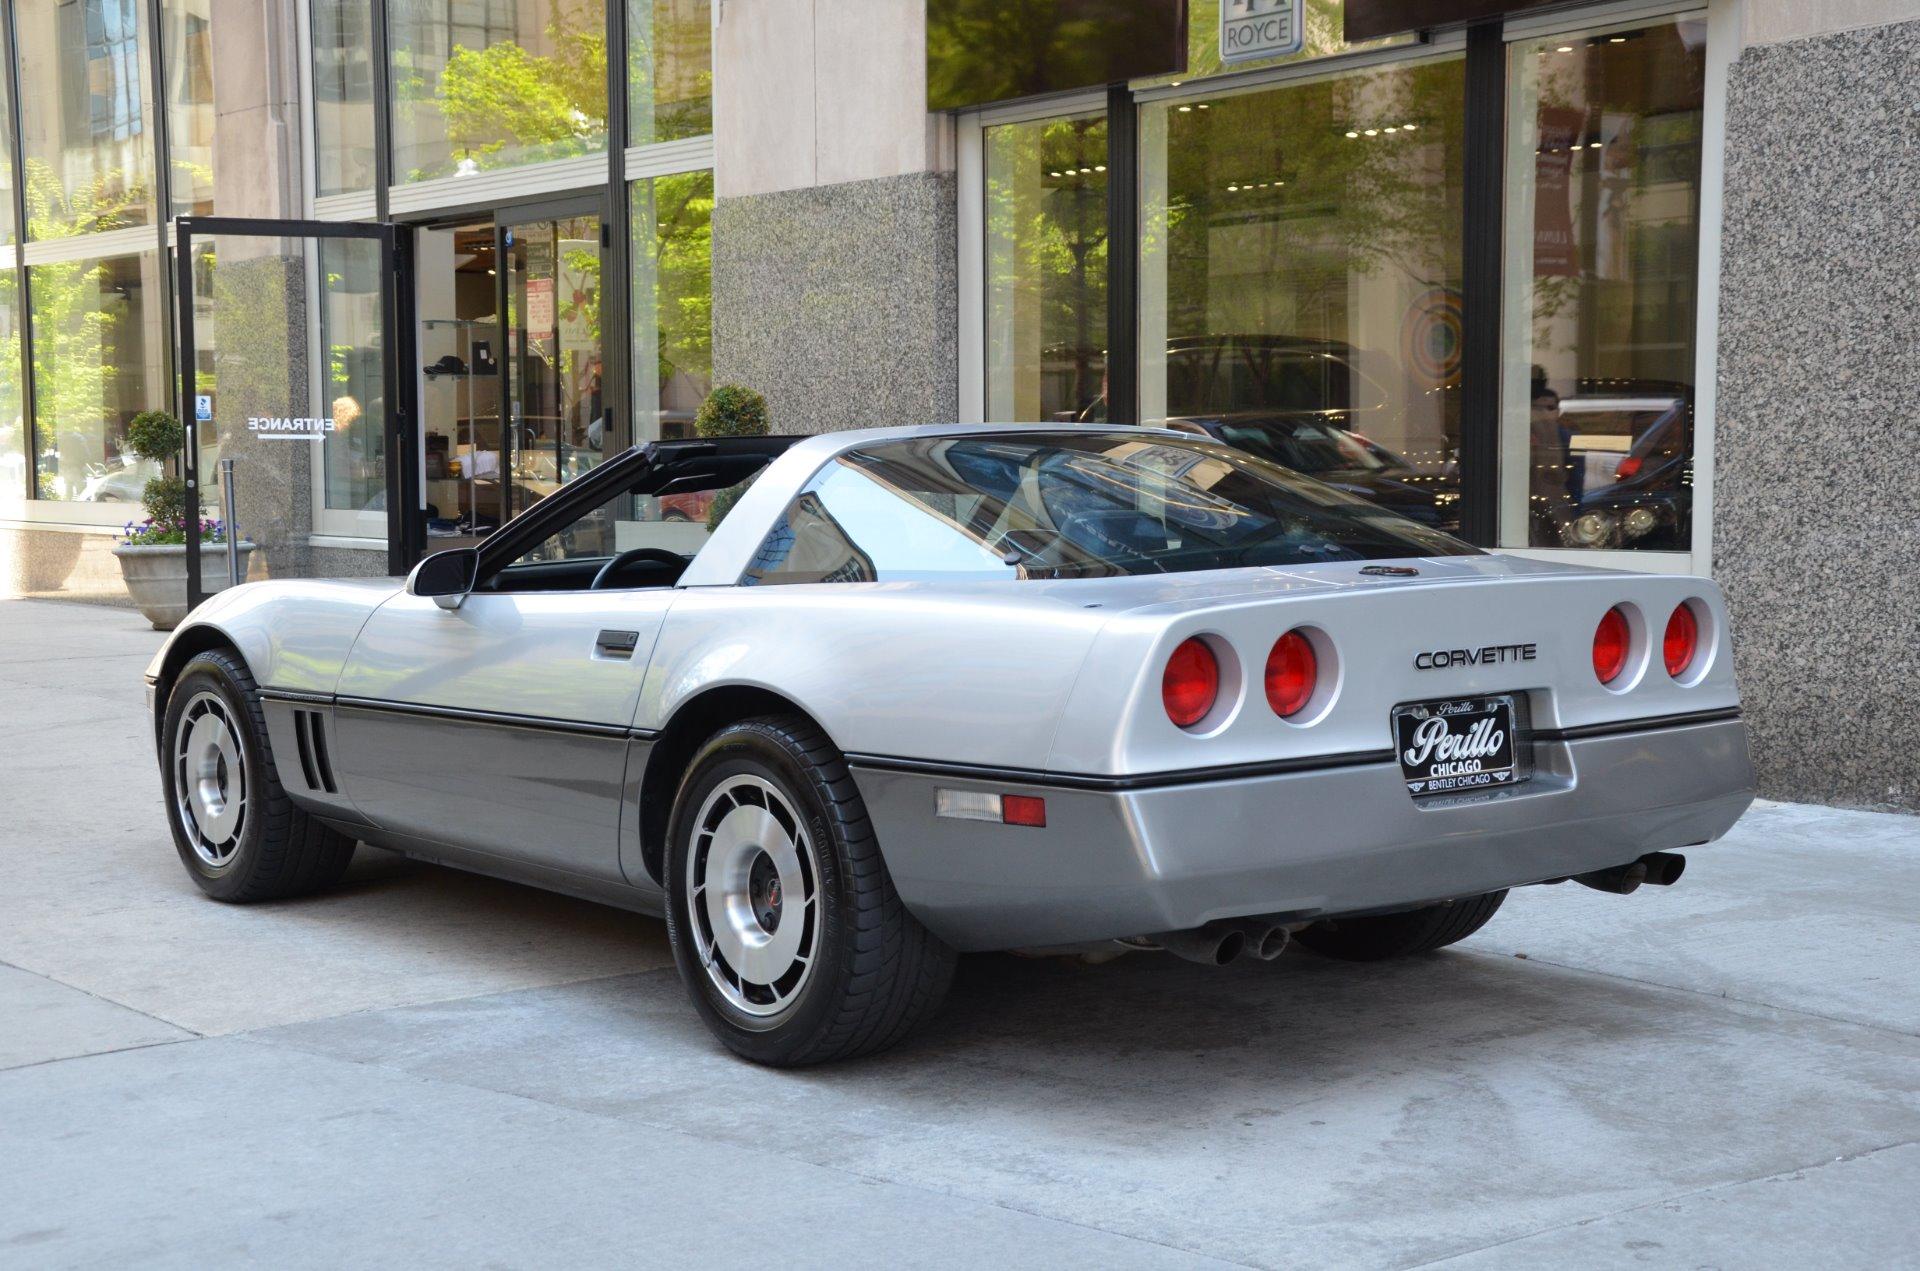 1985 chevrolet corvette stock l319aab for sale near. Black Bedroom Furniture Sets. Home Design Ideas